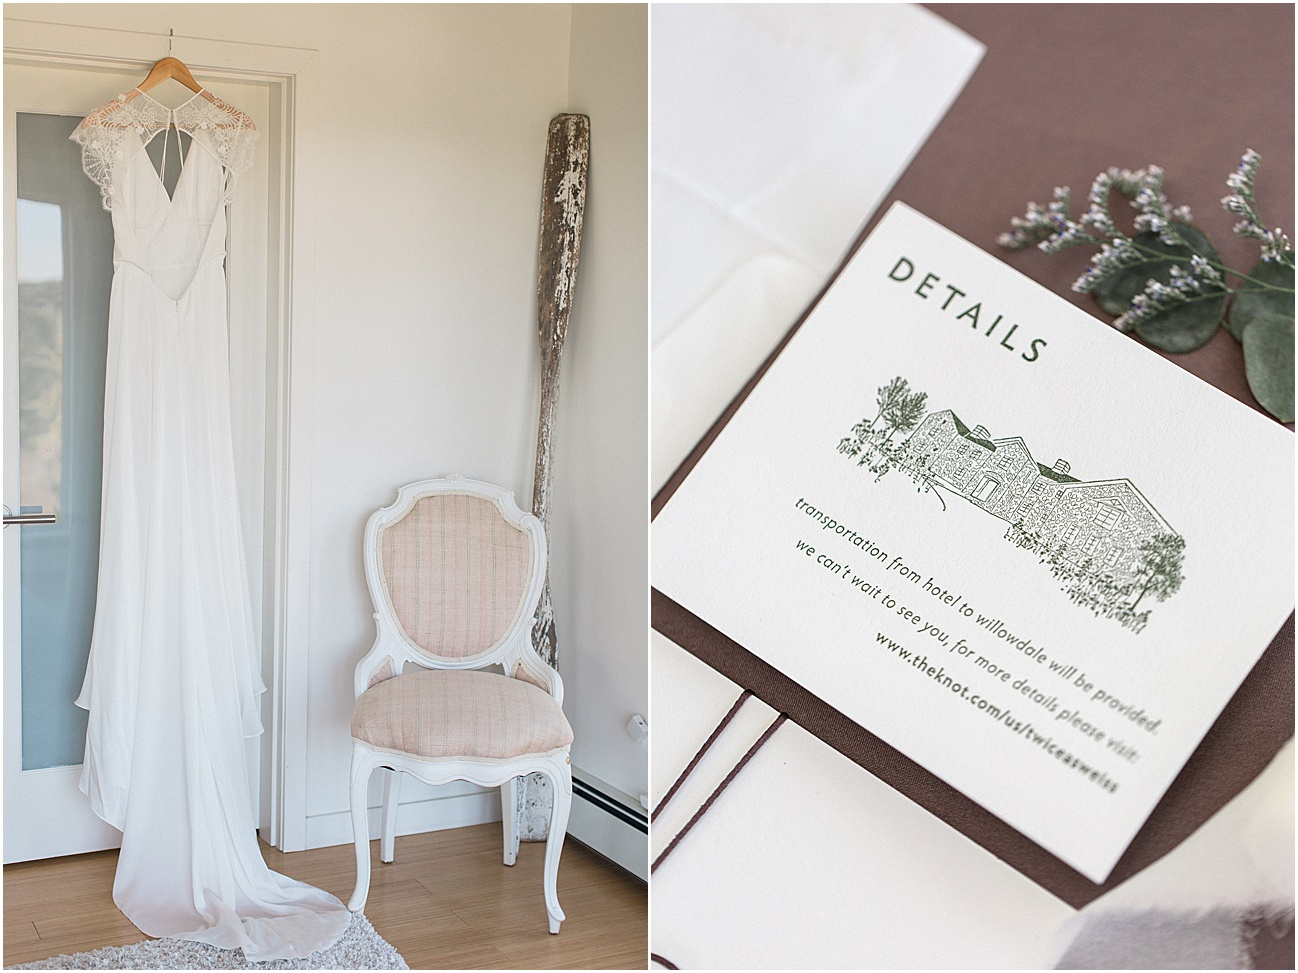 jenna_mike_willowdale_estate_topsfield_neutral_whites_greens_fall_cape_cod_boston_wedding_photographer_meredith_jane_photography_photo_1418.jpg